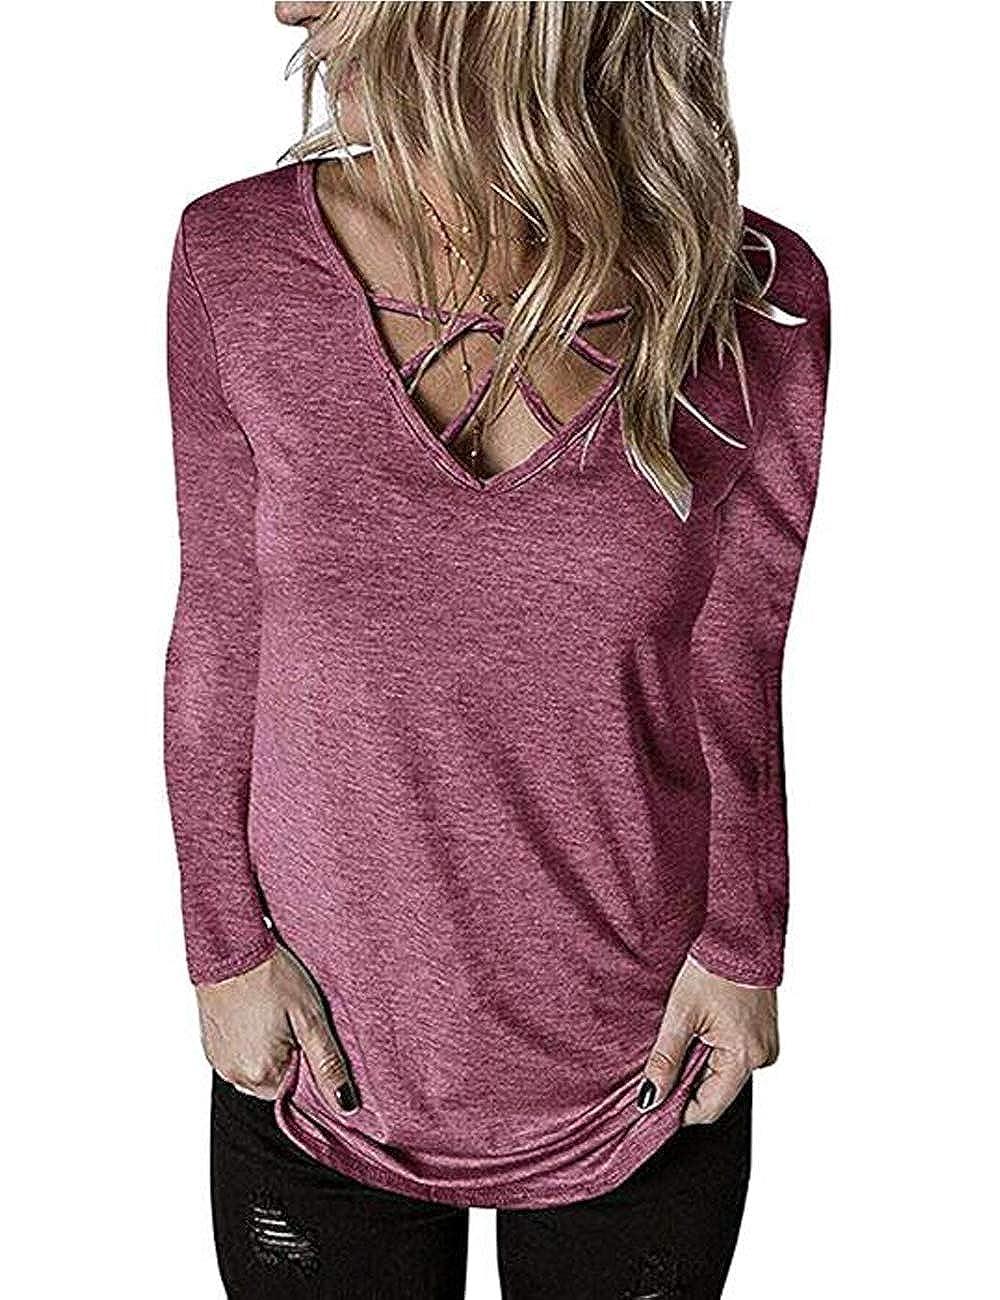 Halife Womens Casual V Neck T-Shirt Criss Cross Long Sleeve Tunic Top Blouses